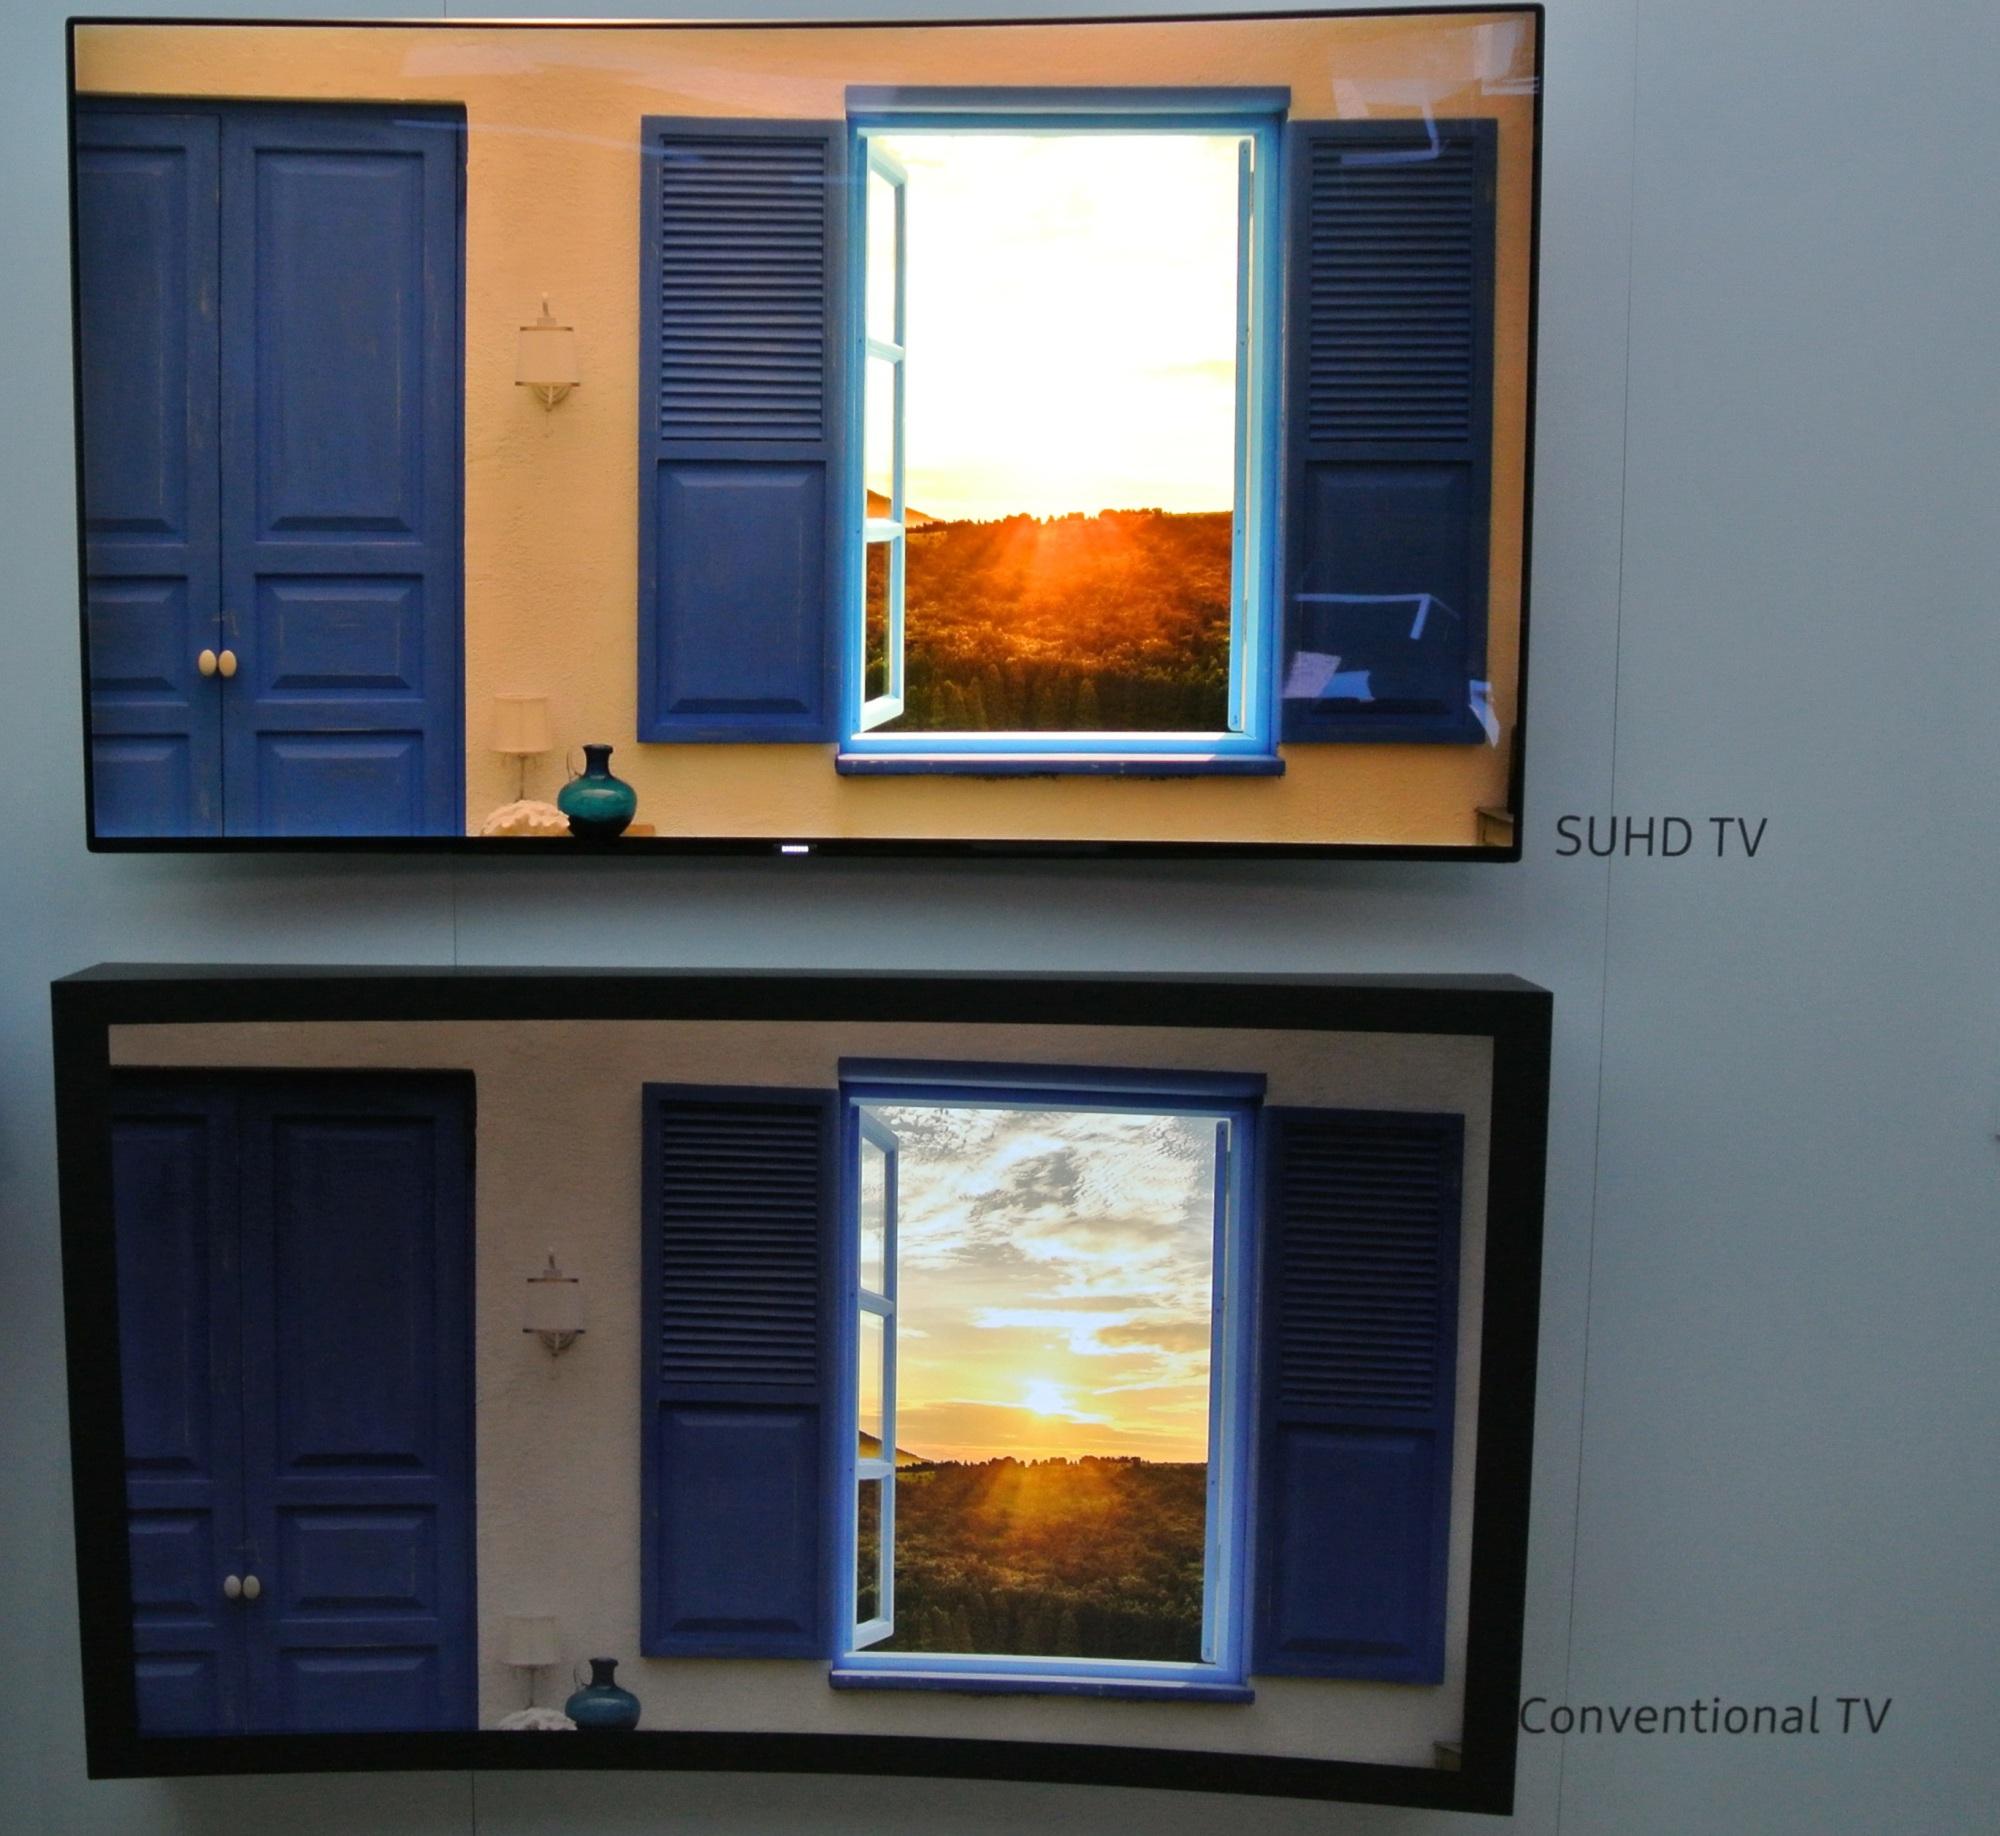 ces 2016 samsungs suhd fernseher mit hdr und quantum dots heise online. Black Bedroom Furniture Sets. Home Design Ideas